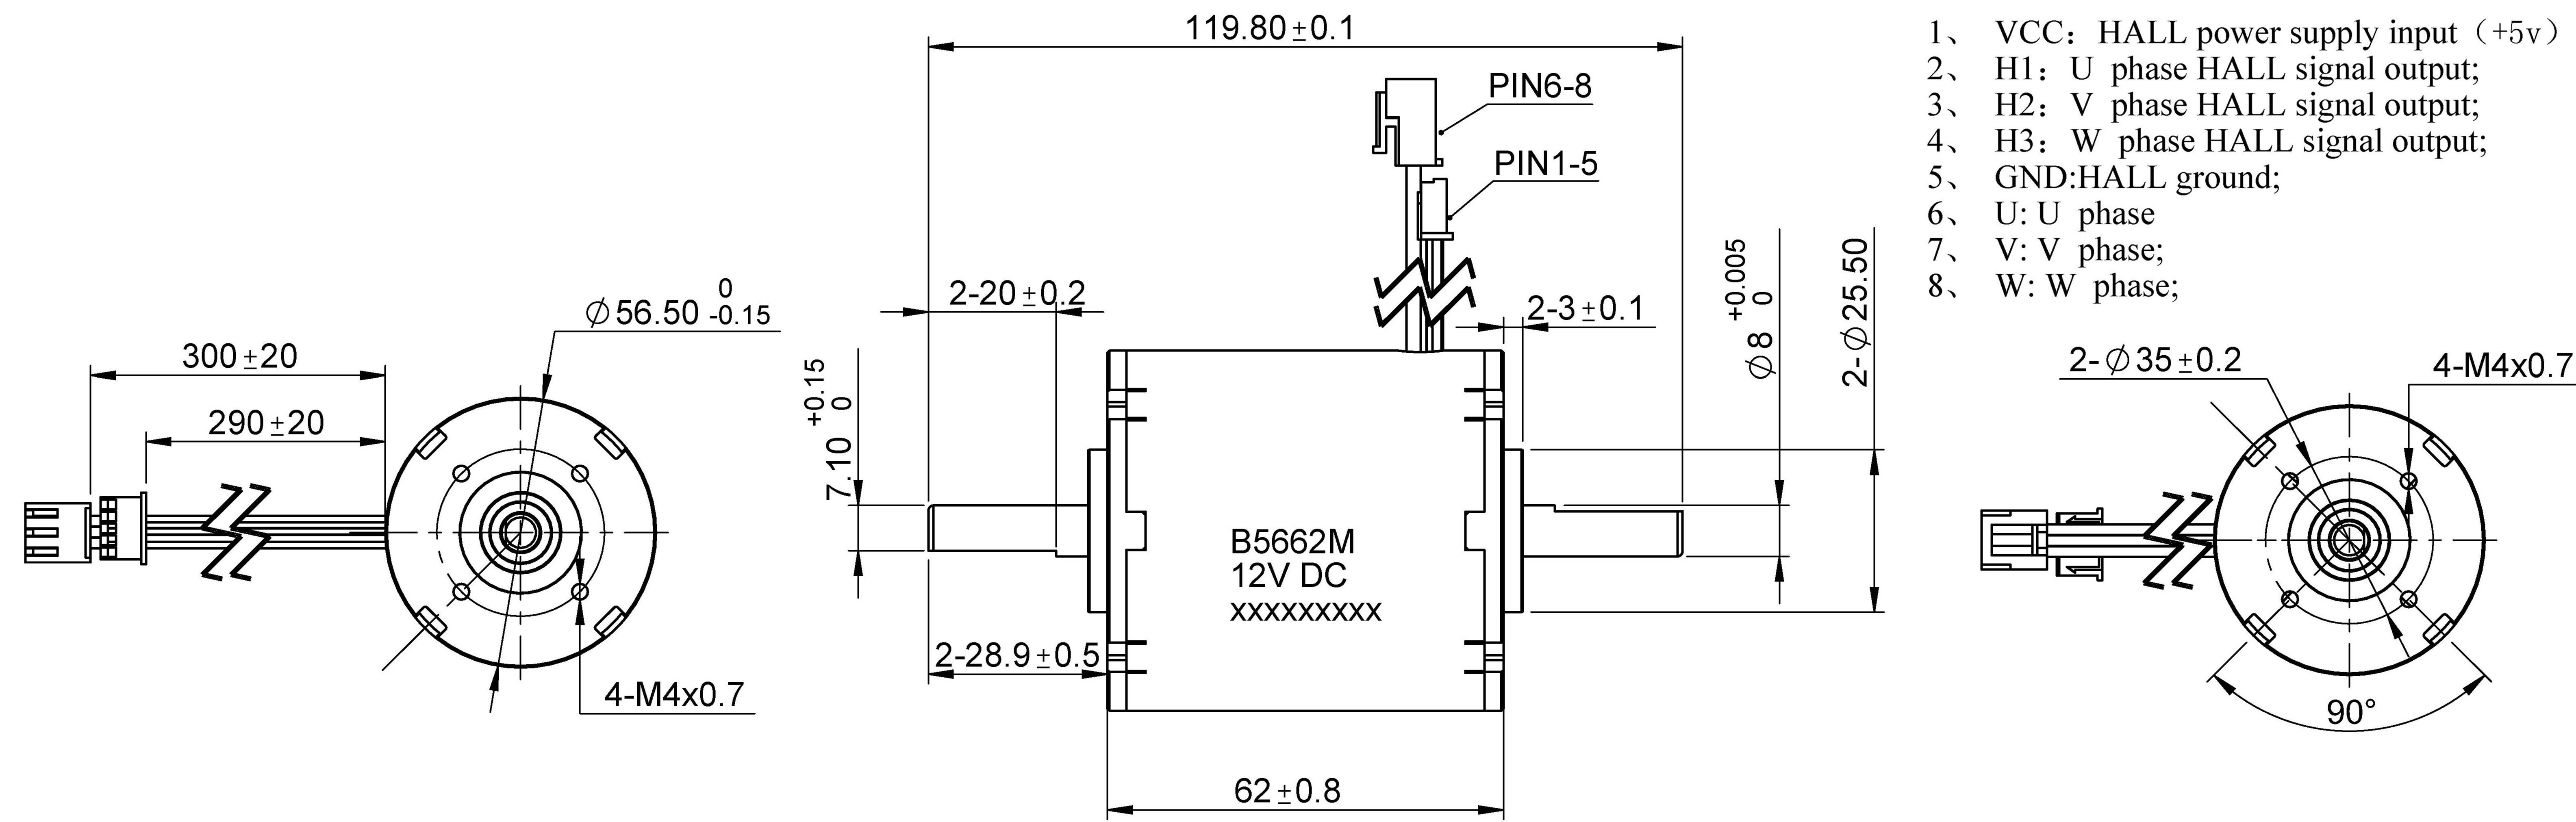 Brushless Dc Electric Motor Diagram B5662m Brushless Dc Motor total Bldc Motors Of Hengdrive Of Brushless Dc Electric Motor Diagram